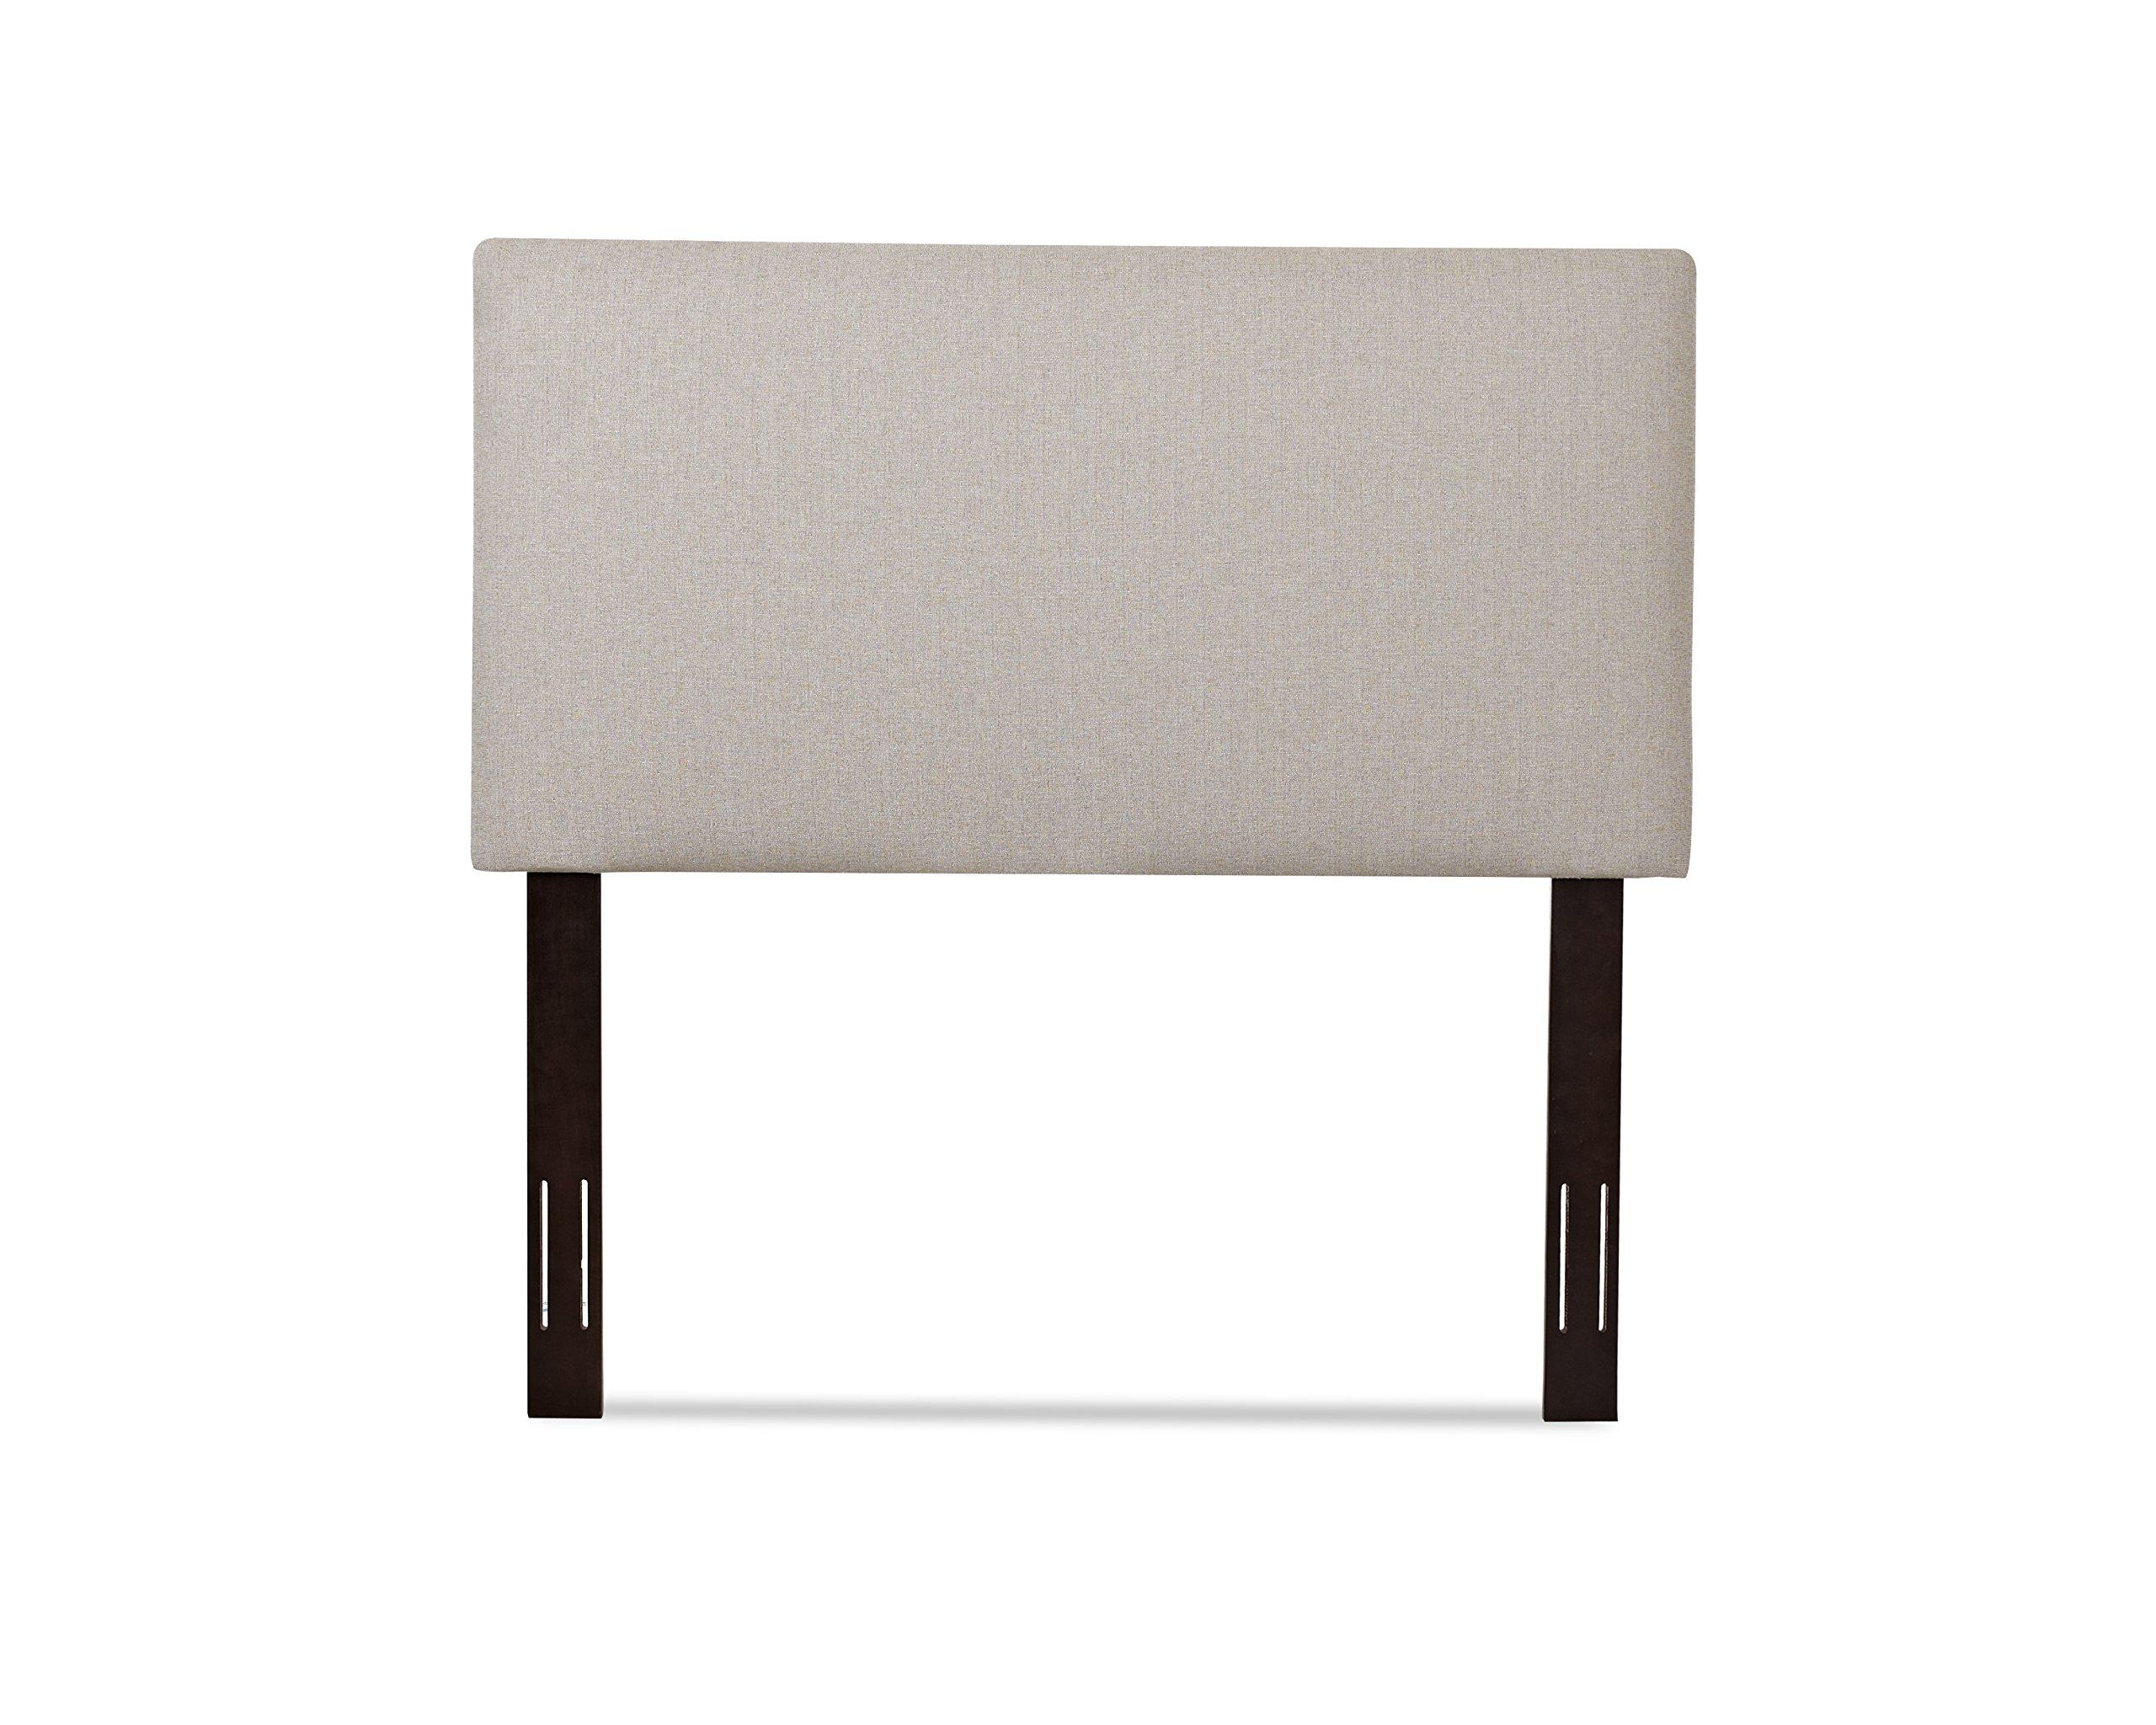 Klaussner Heron Upholstered Headboard, Twin, Beige